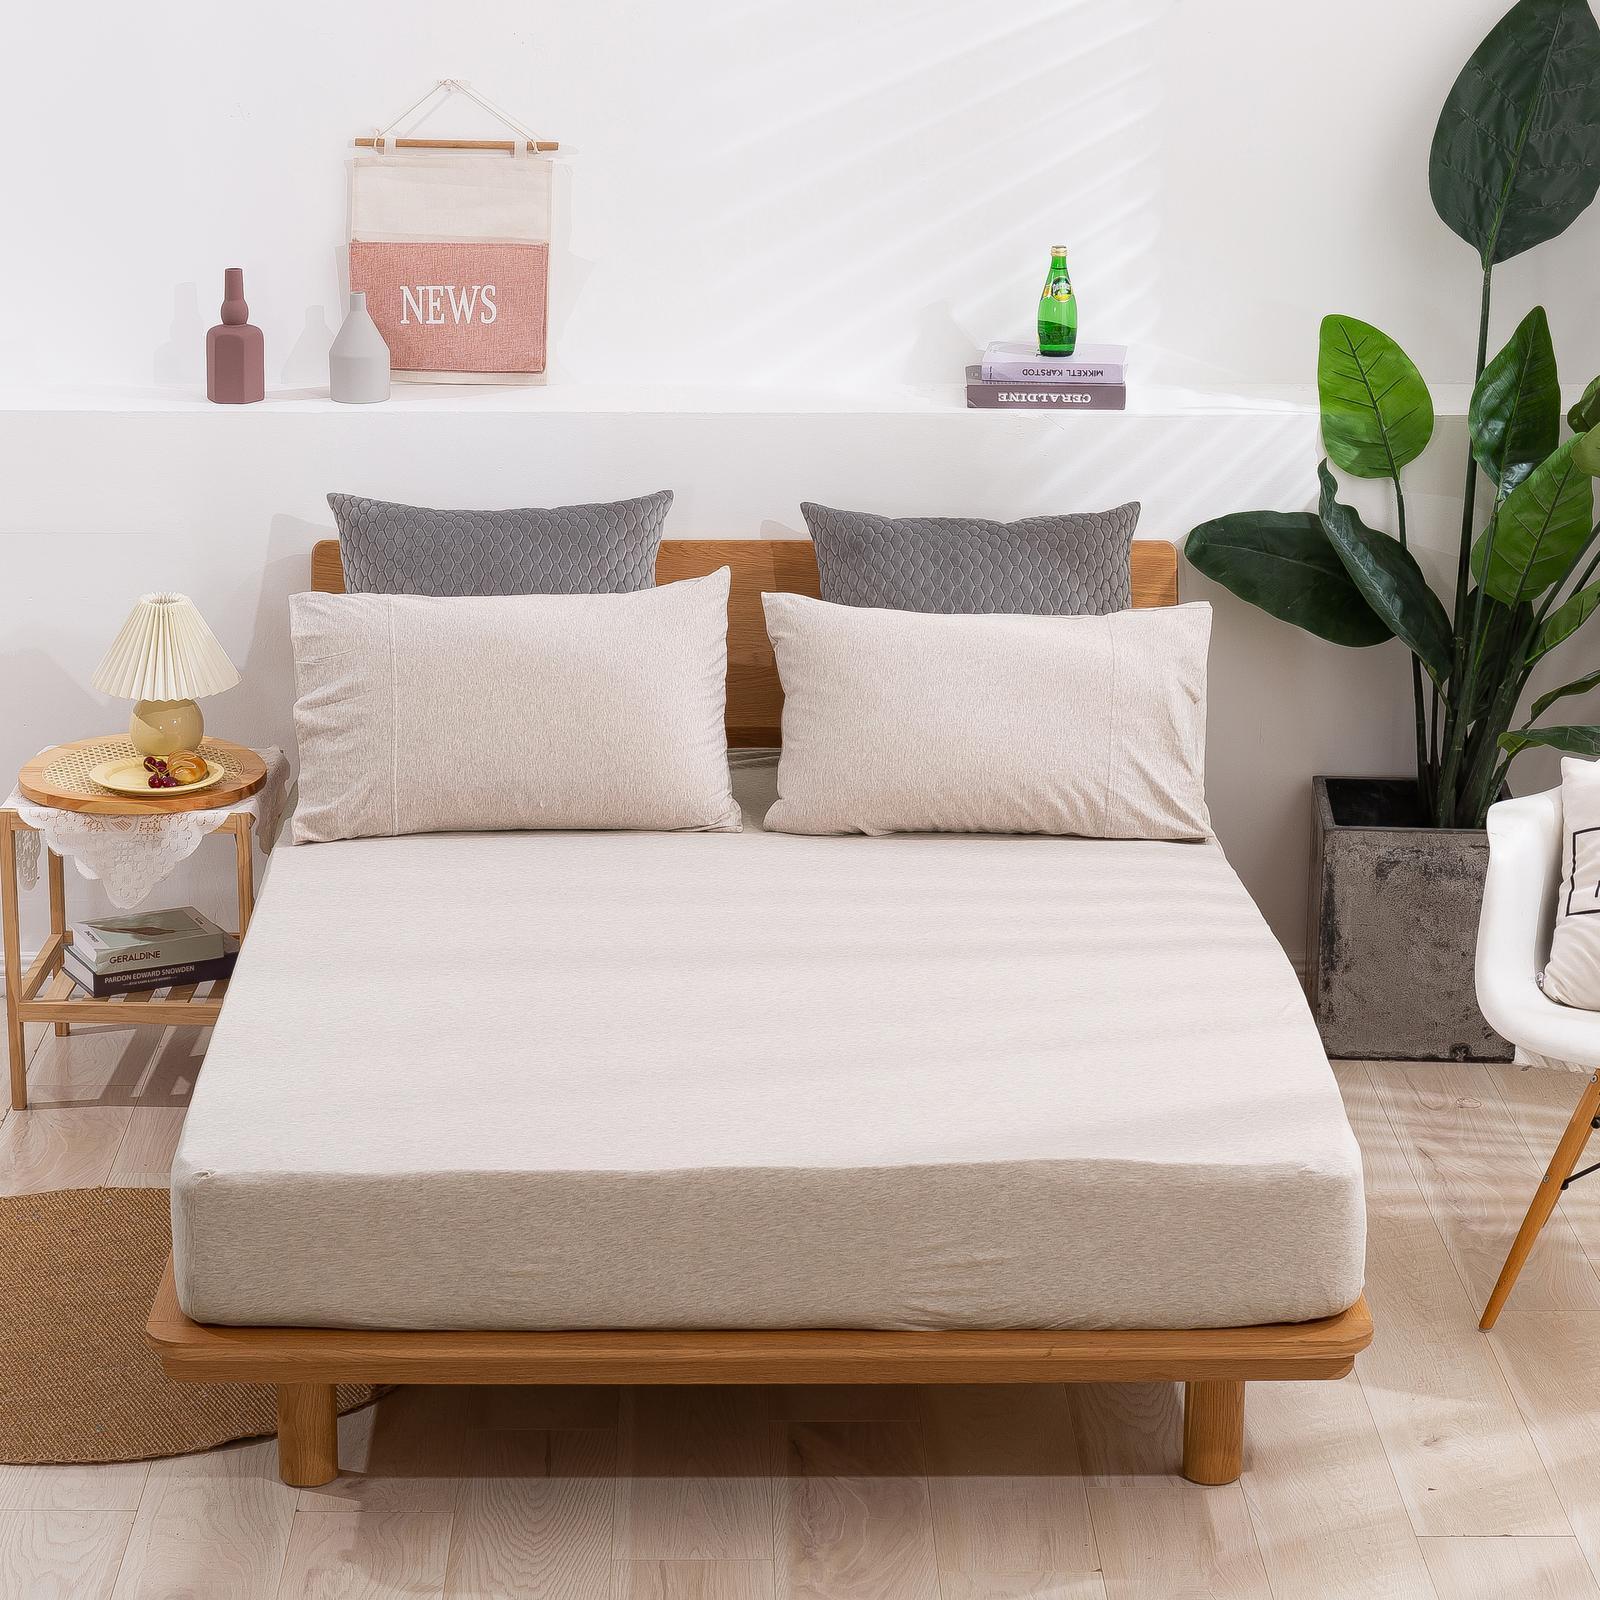 Dreamaker Cotton Jersey Fitted Sheet Latte